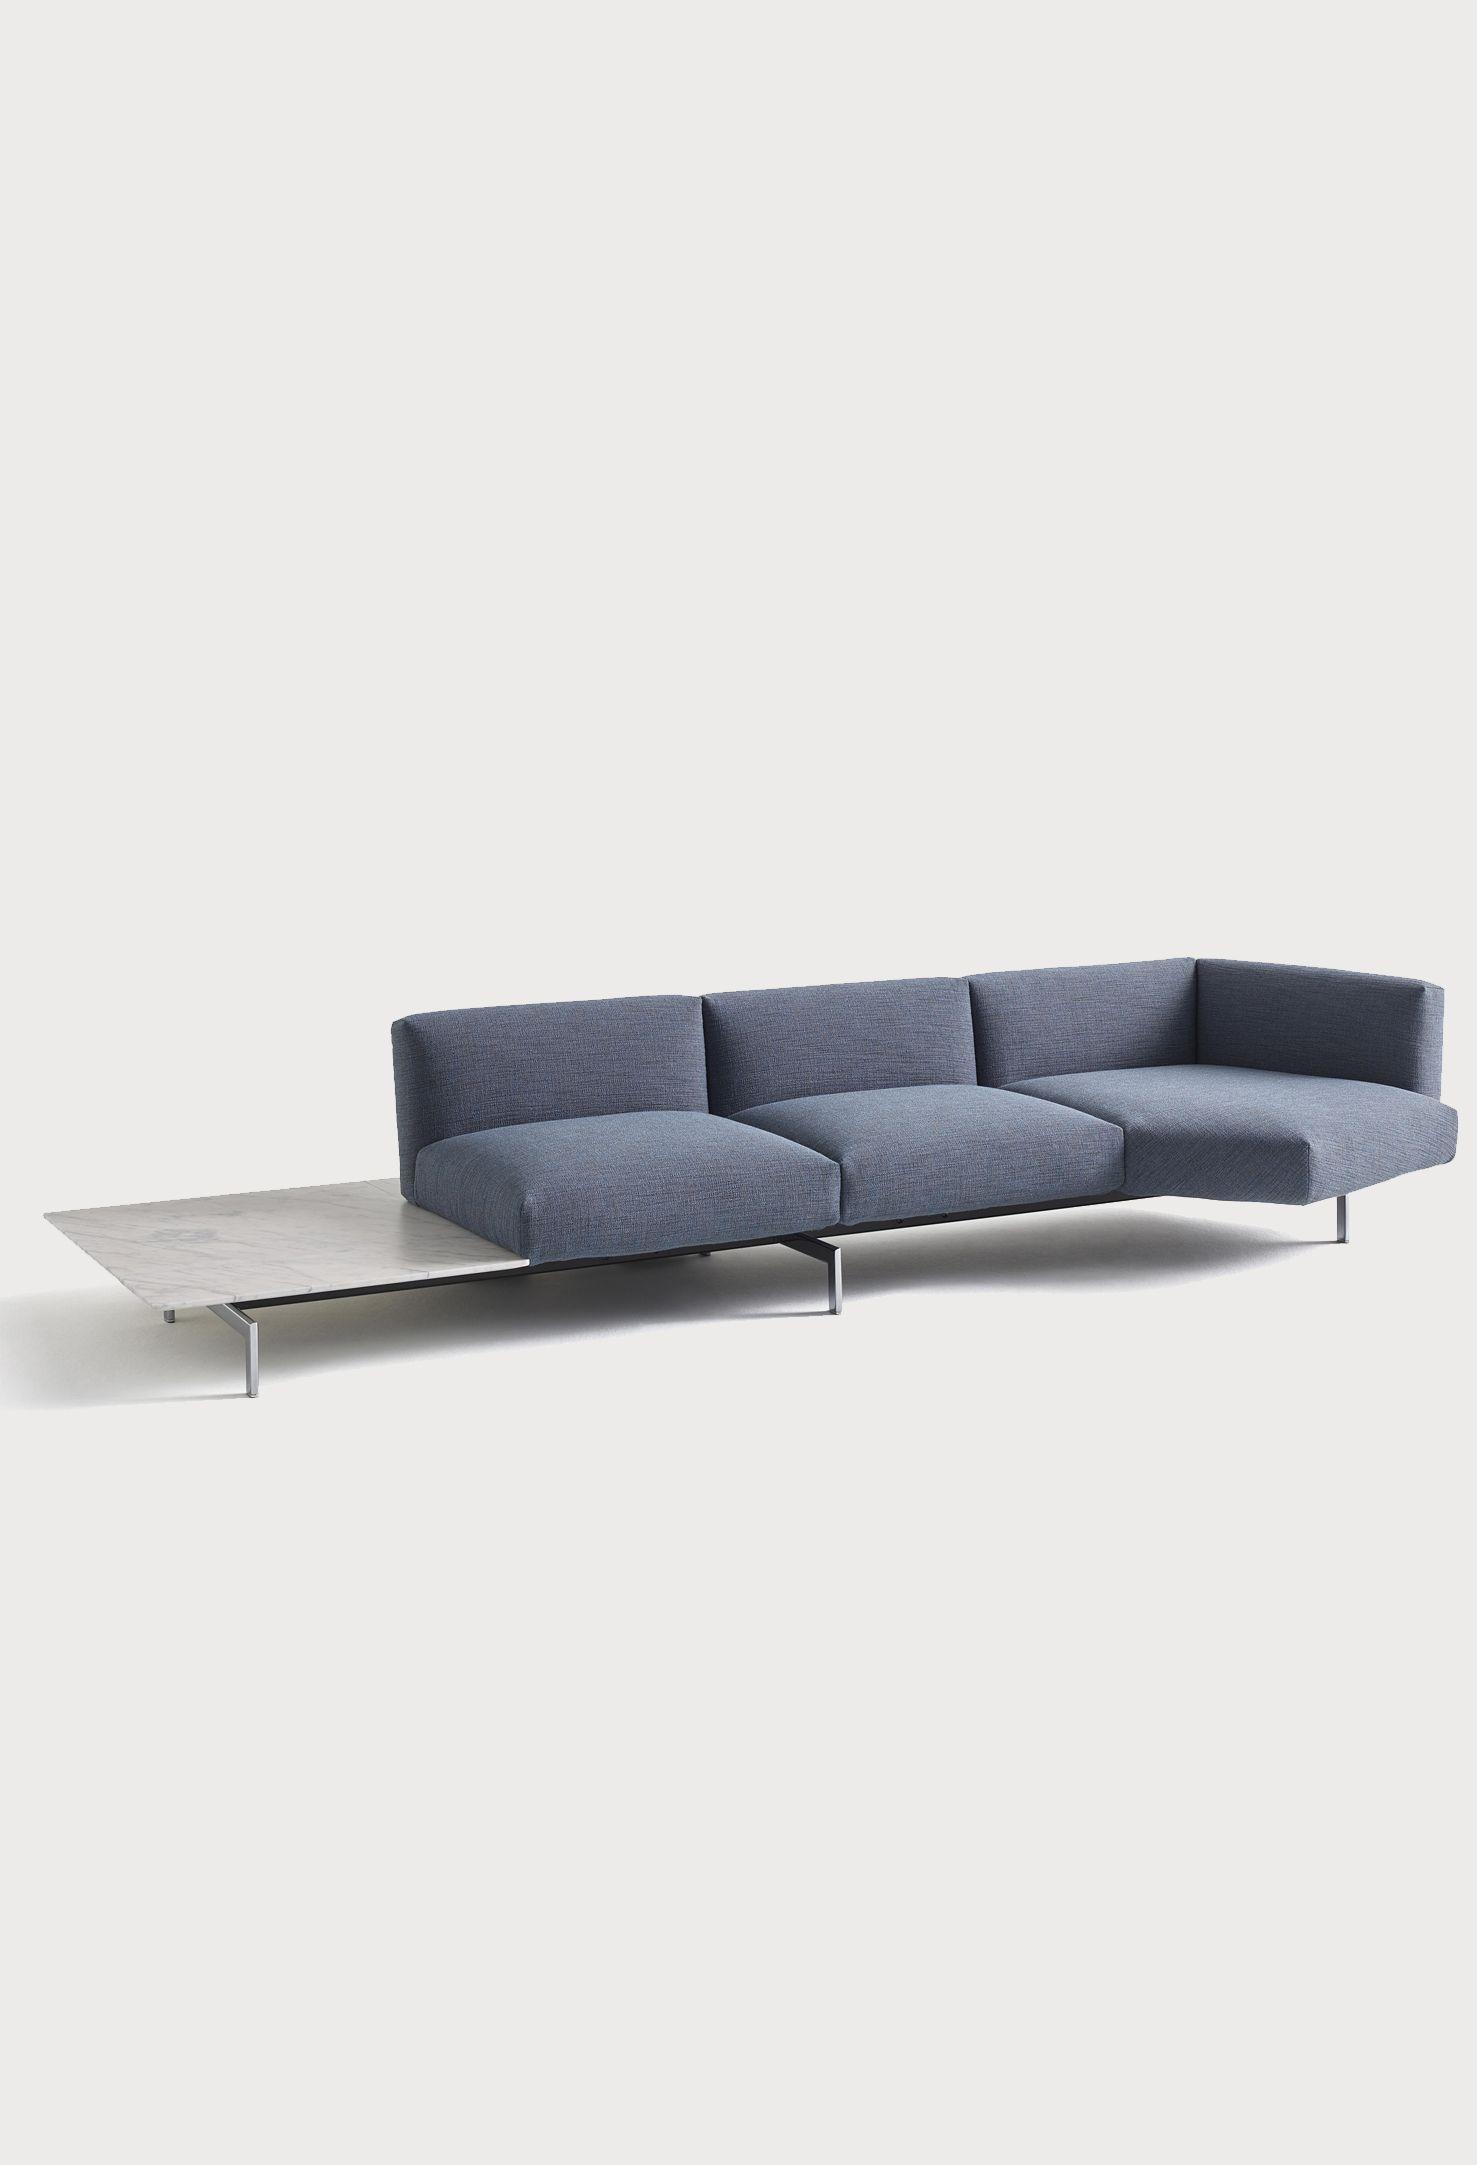 Avio Sofa Knoll Modular Sofa Home Decor Furniture